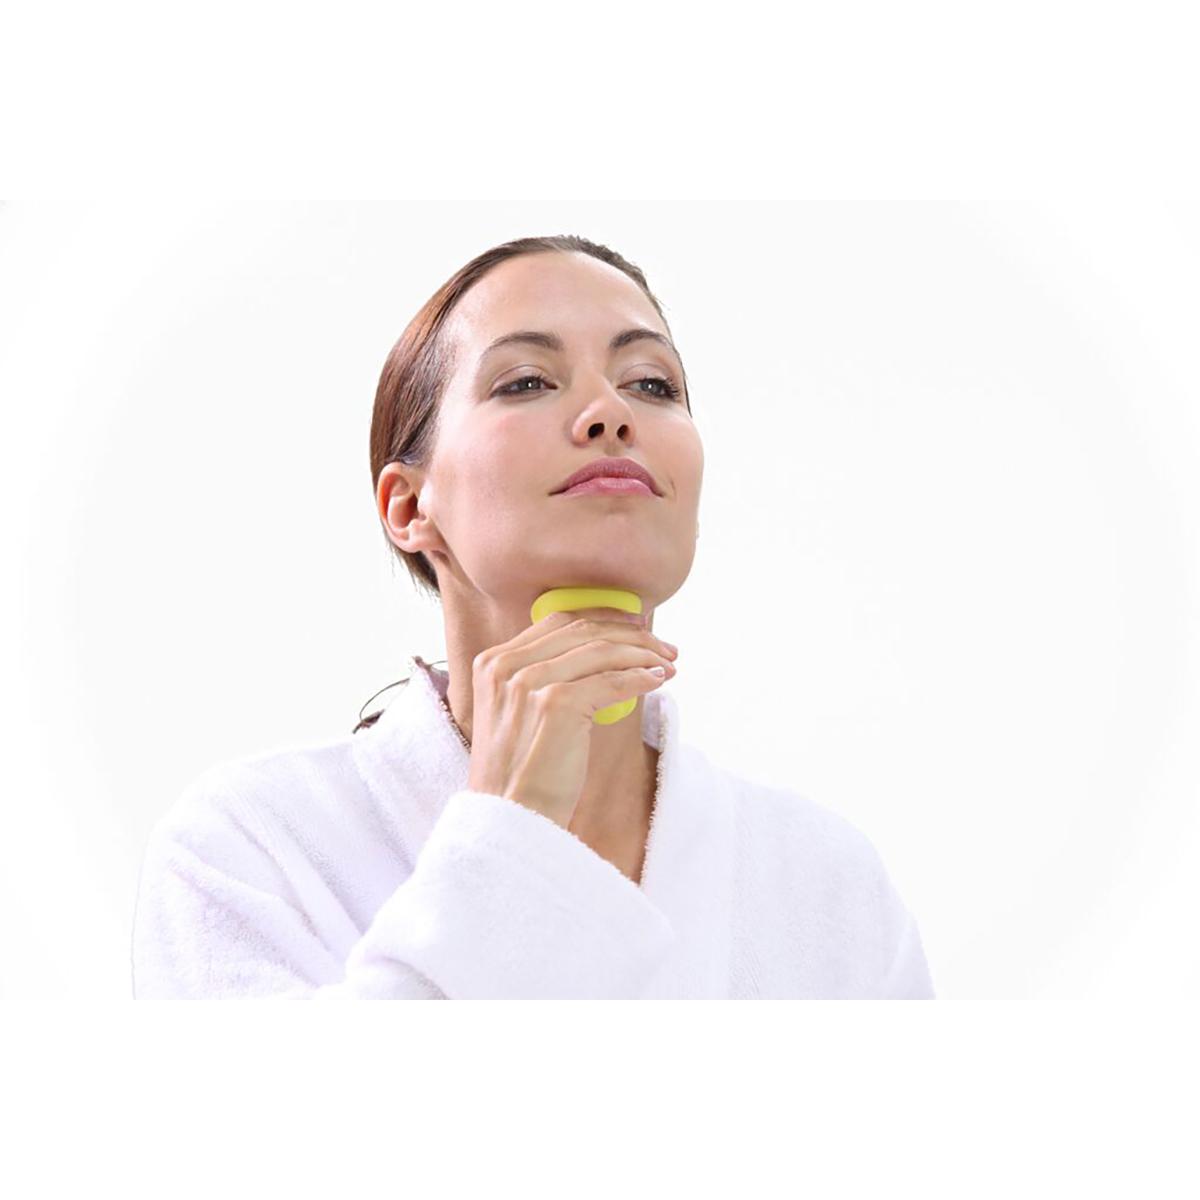 Bellabambi solo jaune med 2050 1 1016 accessoires de massage manuels - Accessoires de massage ...